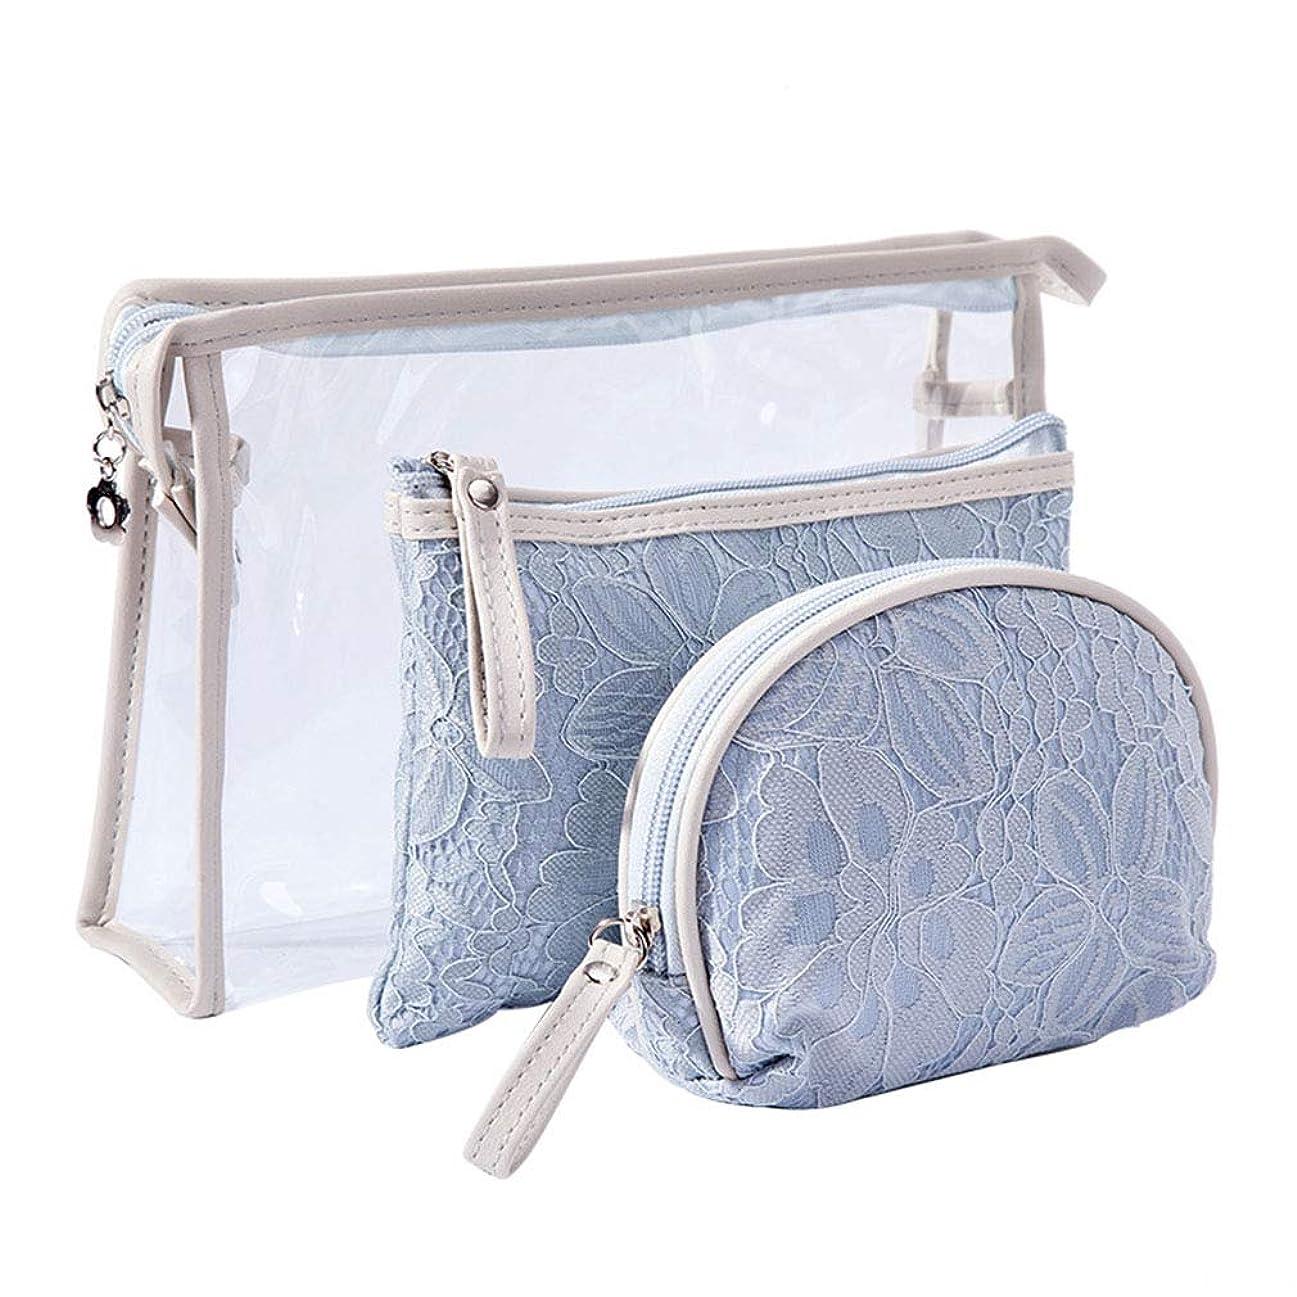 Allforlife 化粧ポーチ 洗面具ポーチ トラベルポーチ 多機能な収納バッグ 実用3点セット 持ち運び用 大容量 かわいい (スカイブルー)